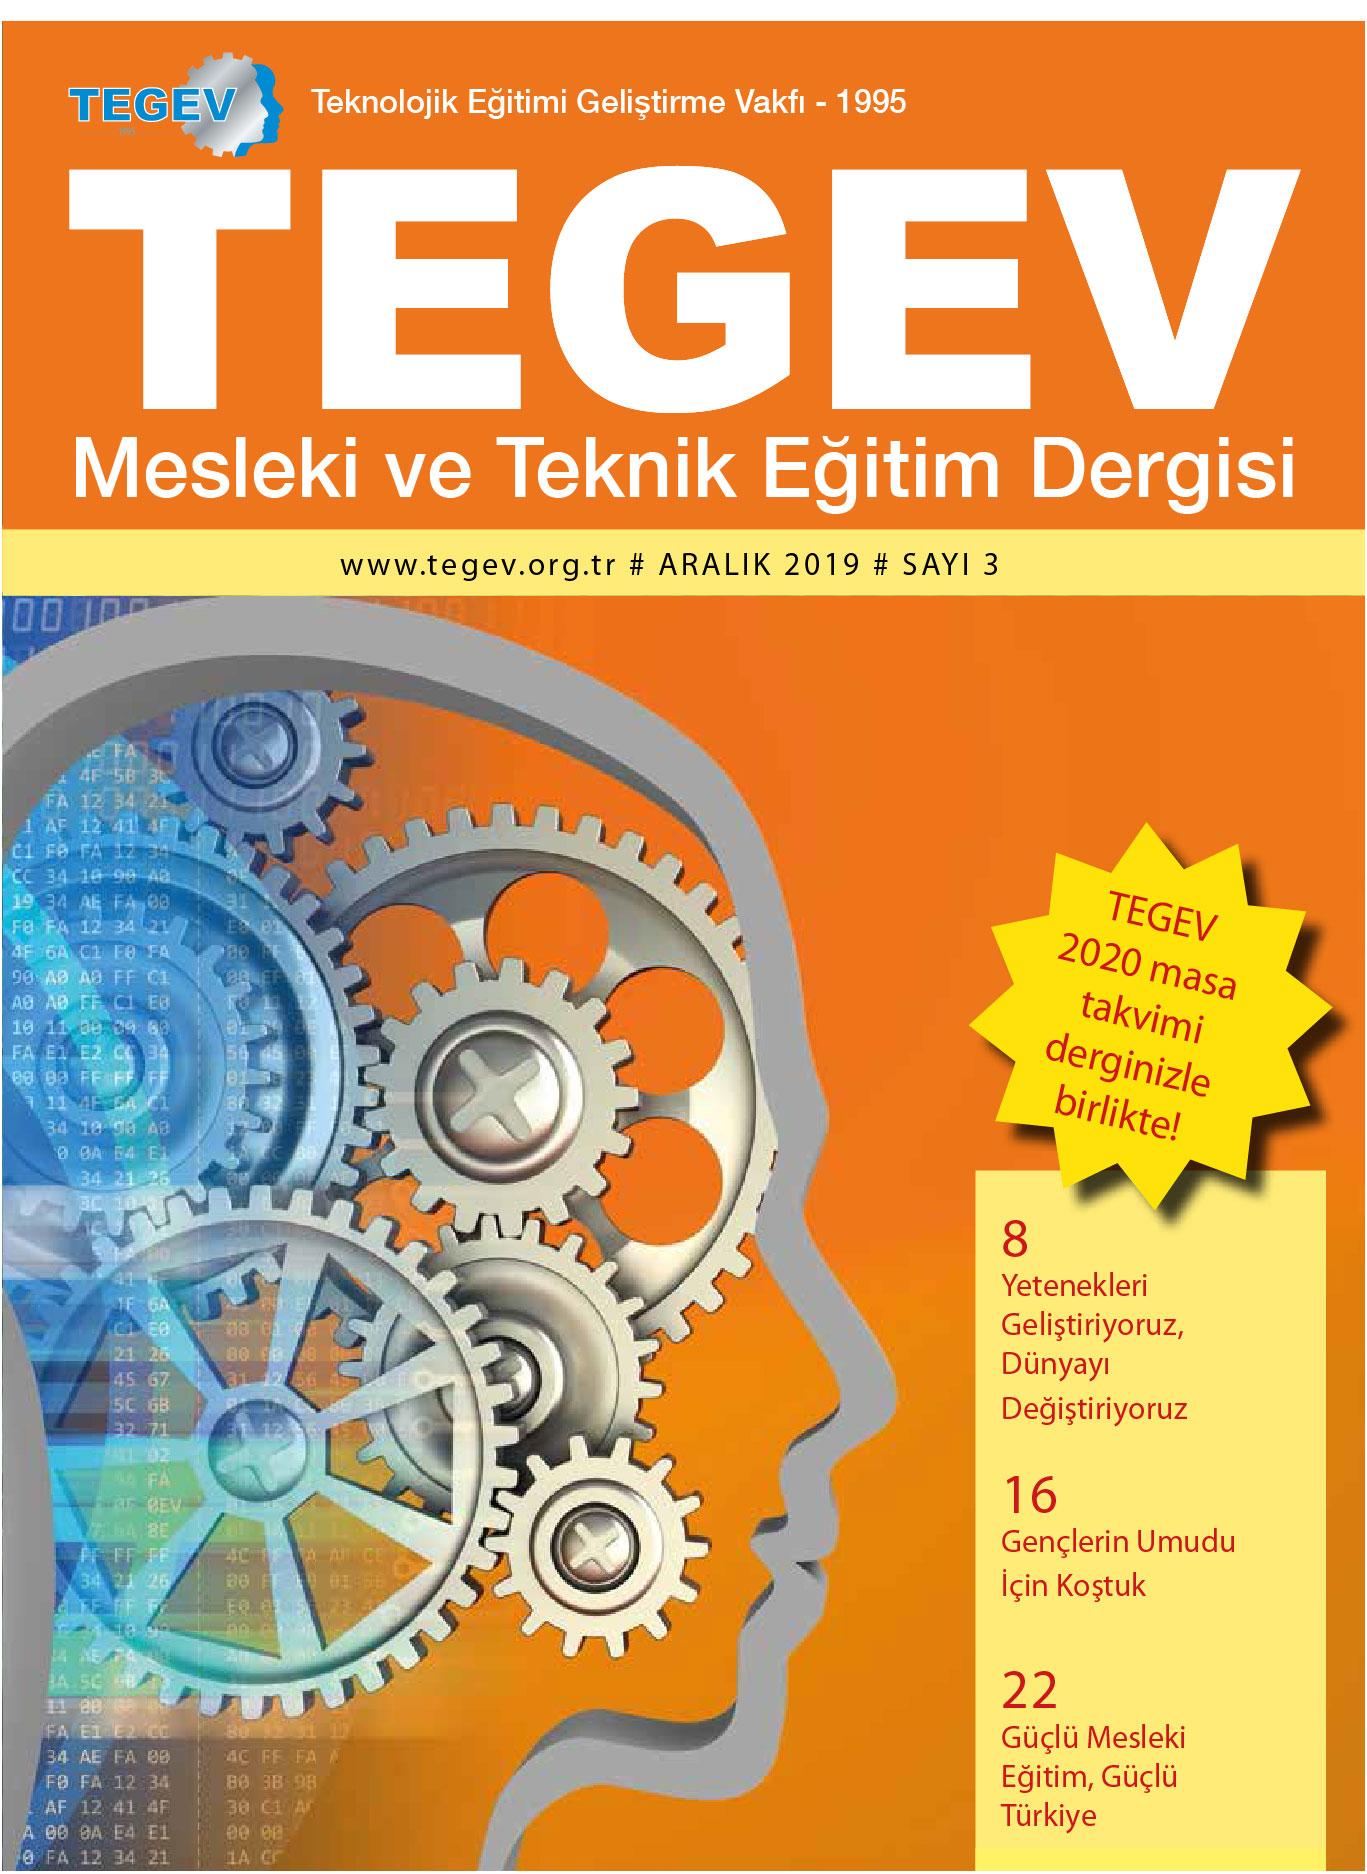 tegev-dergi-aralik-2019-sayi-3